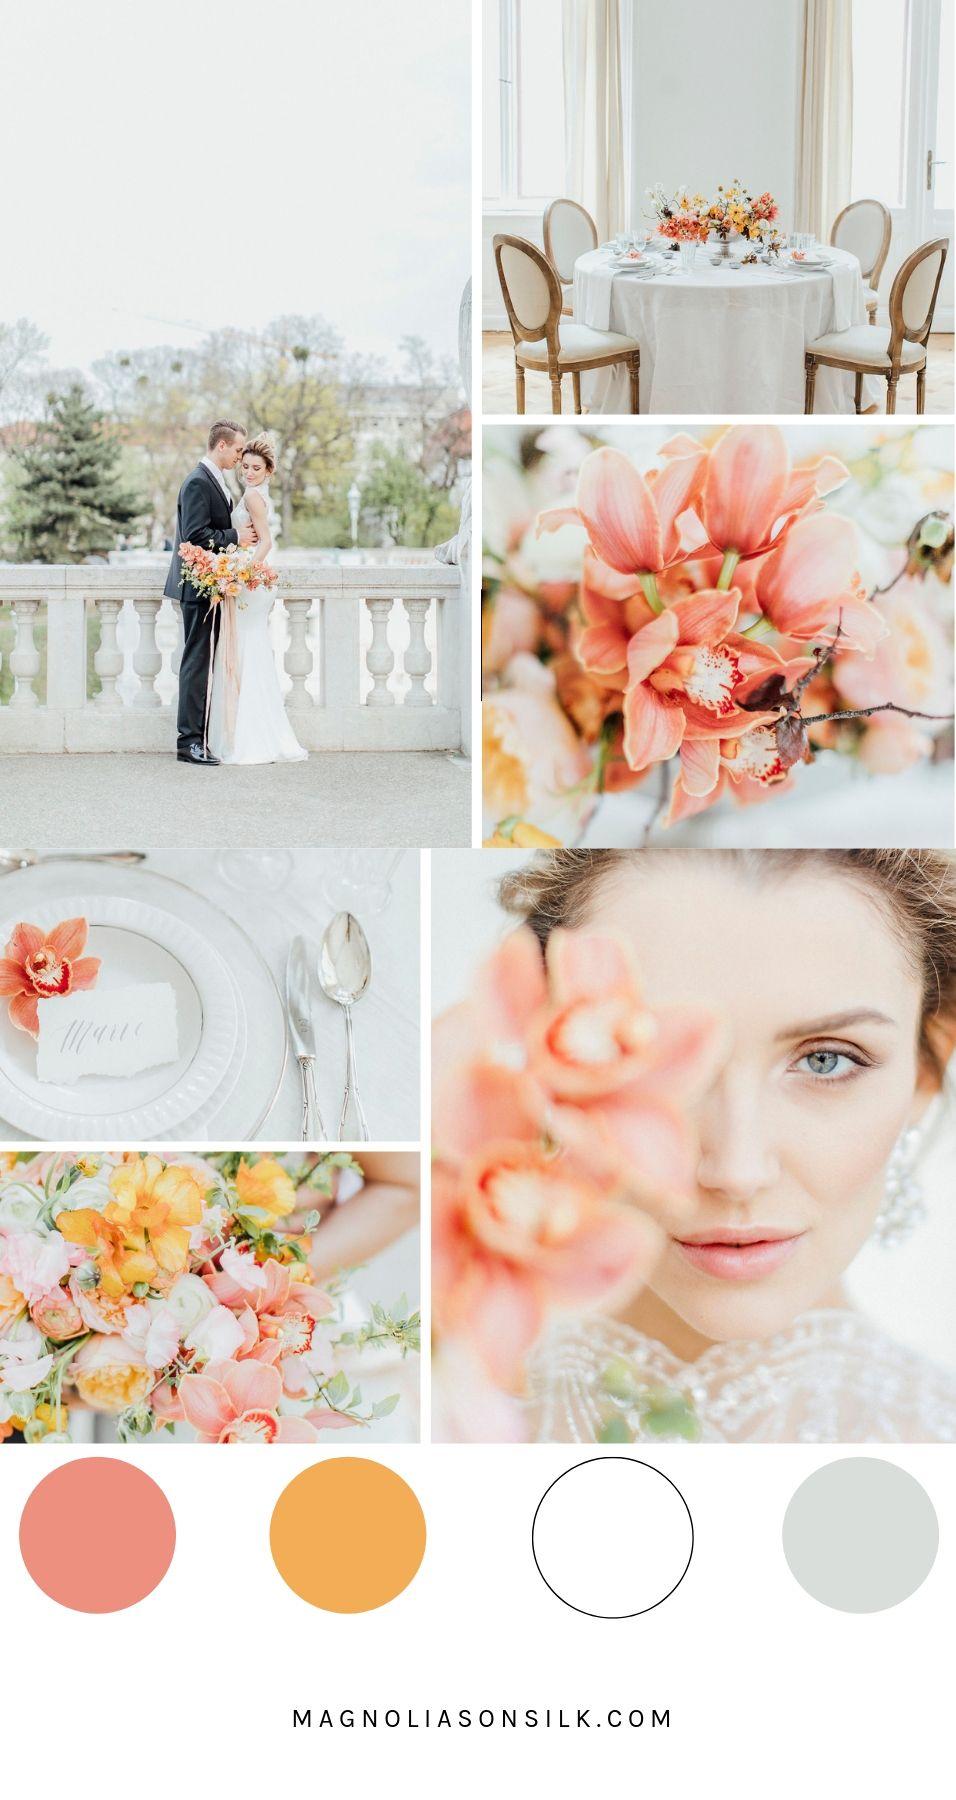 Top 5 Spring Wedding Color Palettes Magnolias On Silk Coral Wedding Colors Wedding Color Schemes Spring Wedding Color Pallet